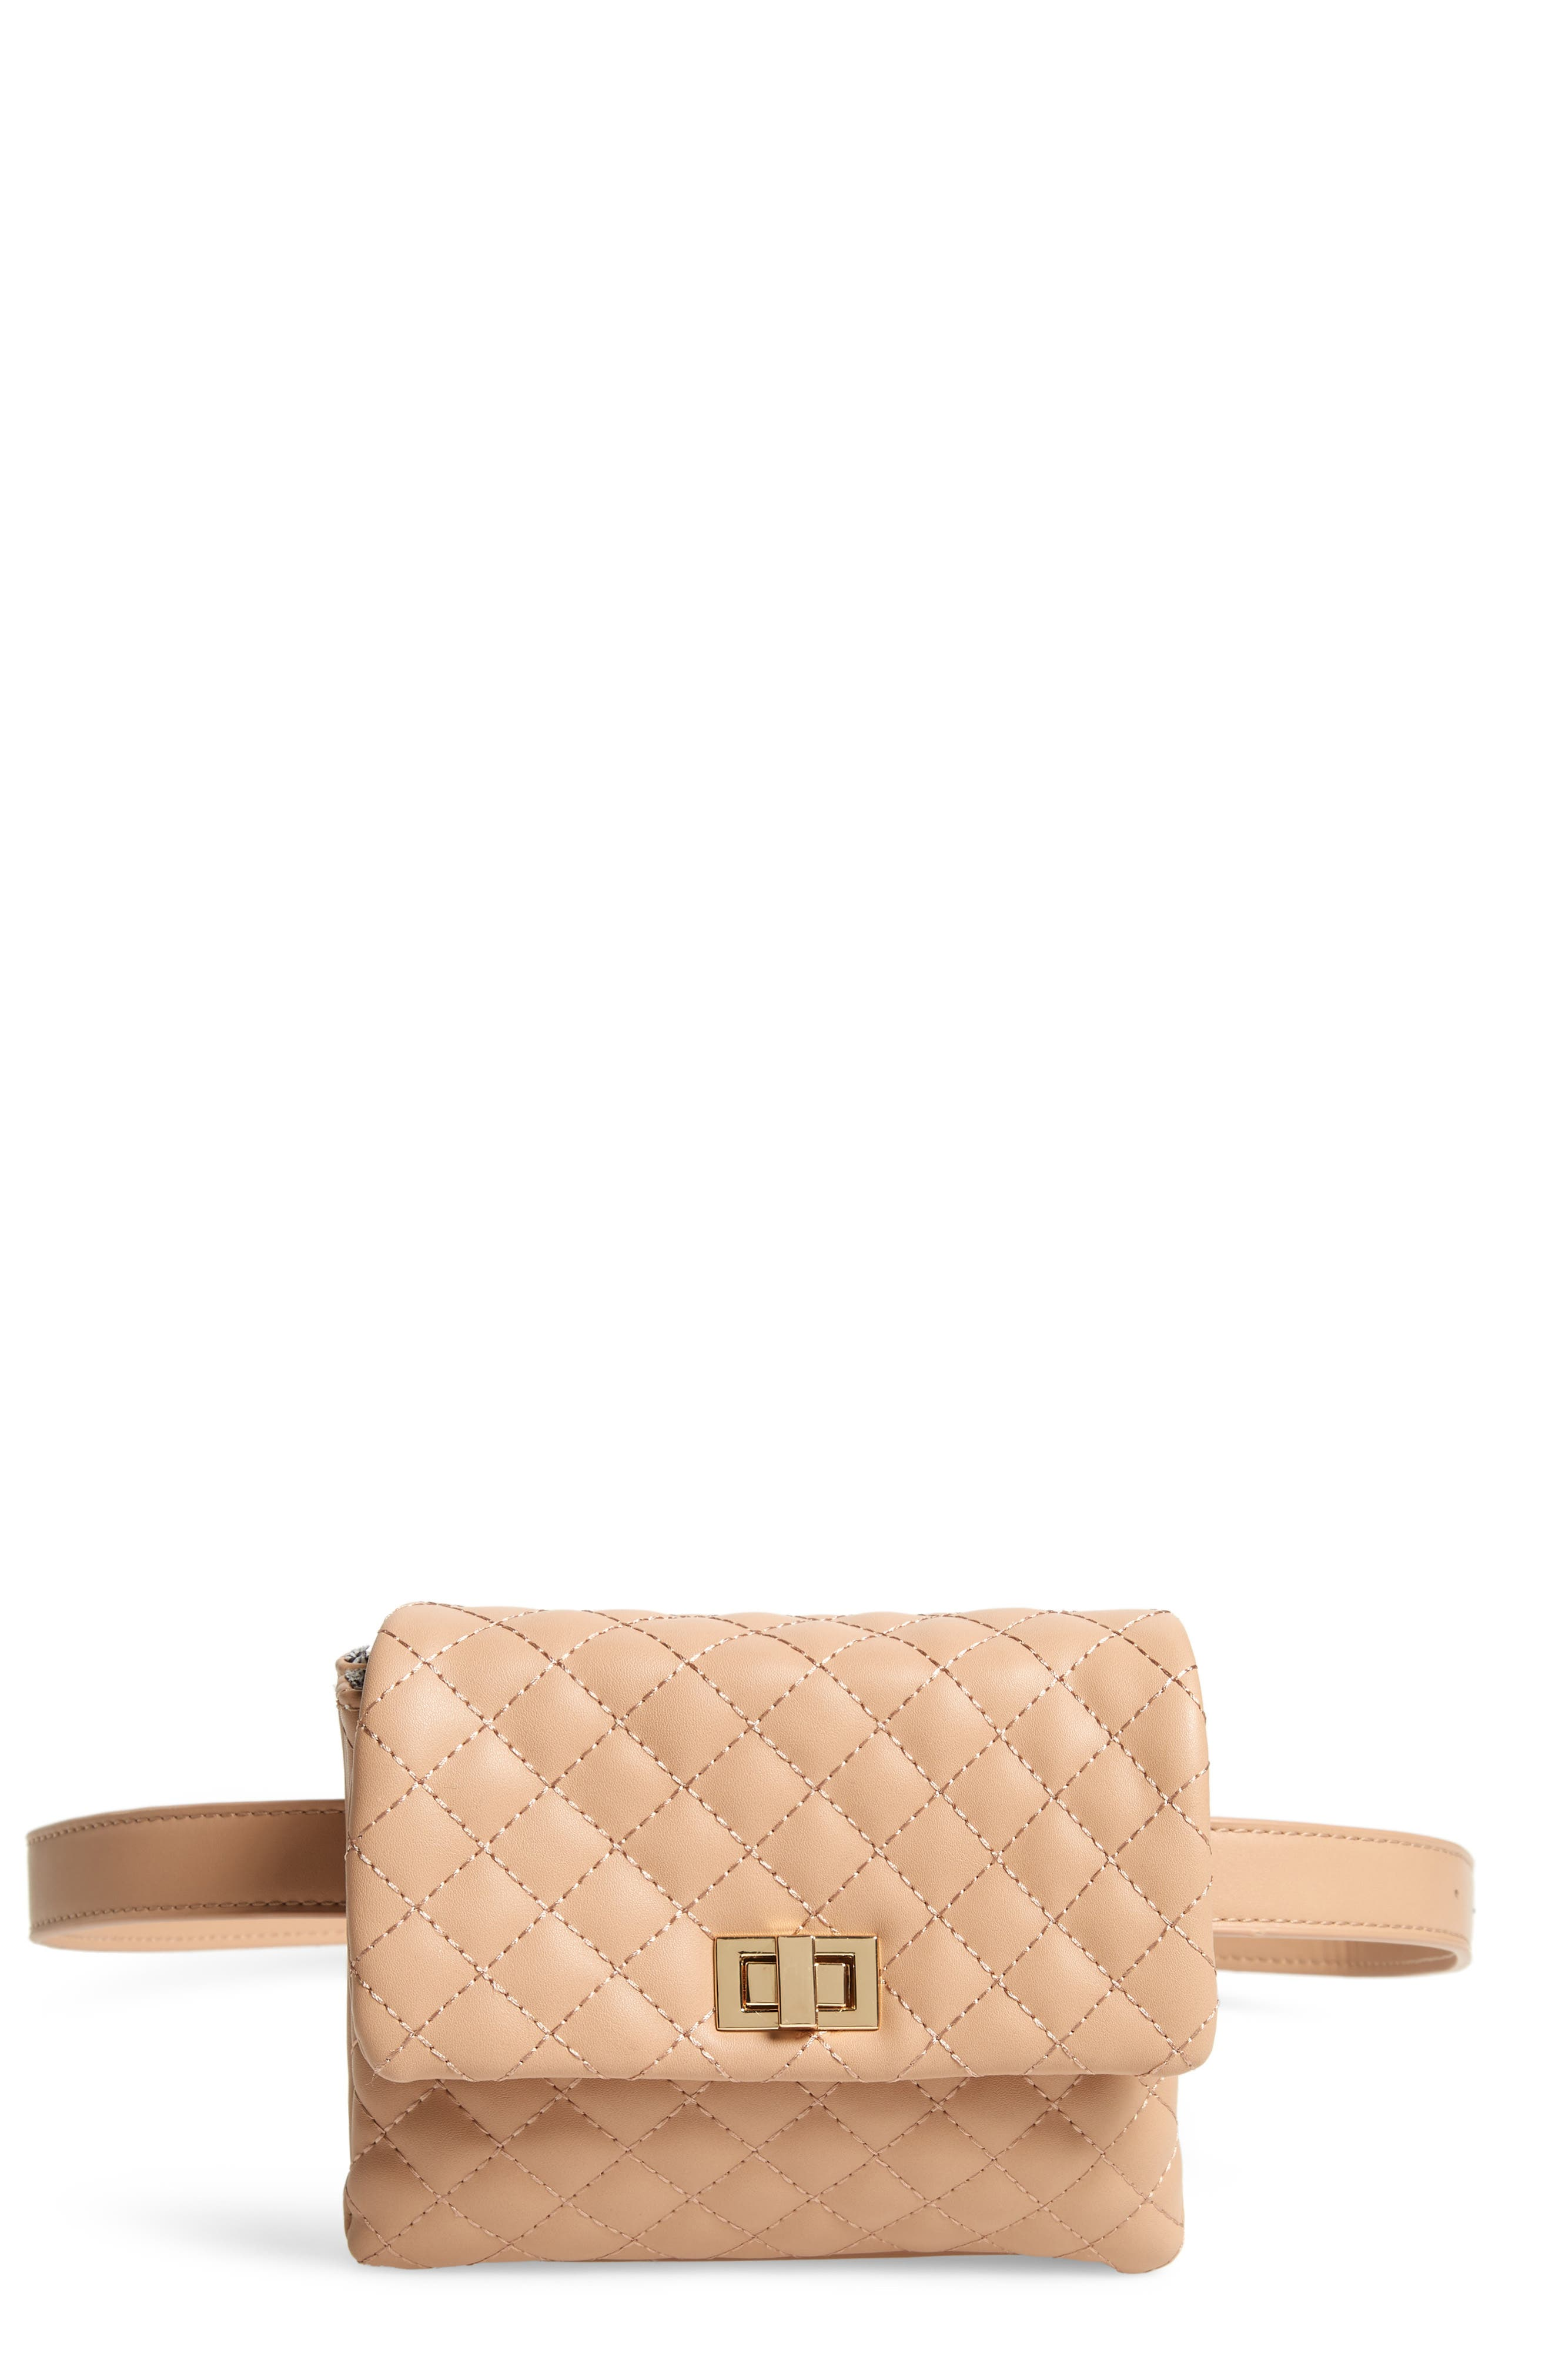 Mali + Lili Quilted Vegan Leather Belt Bag,                             Main thumbnail 1, color,                             CAMEL